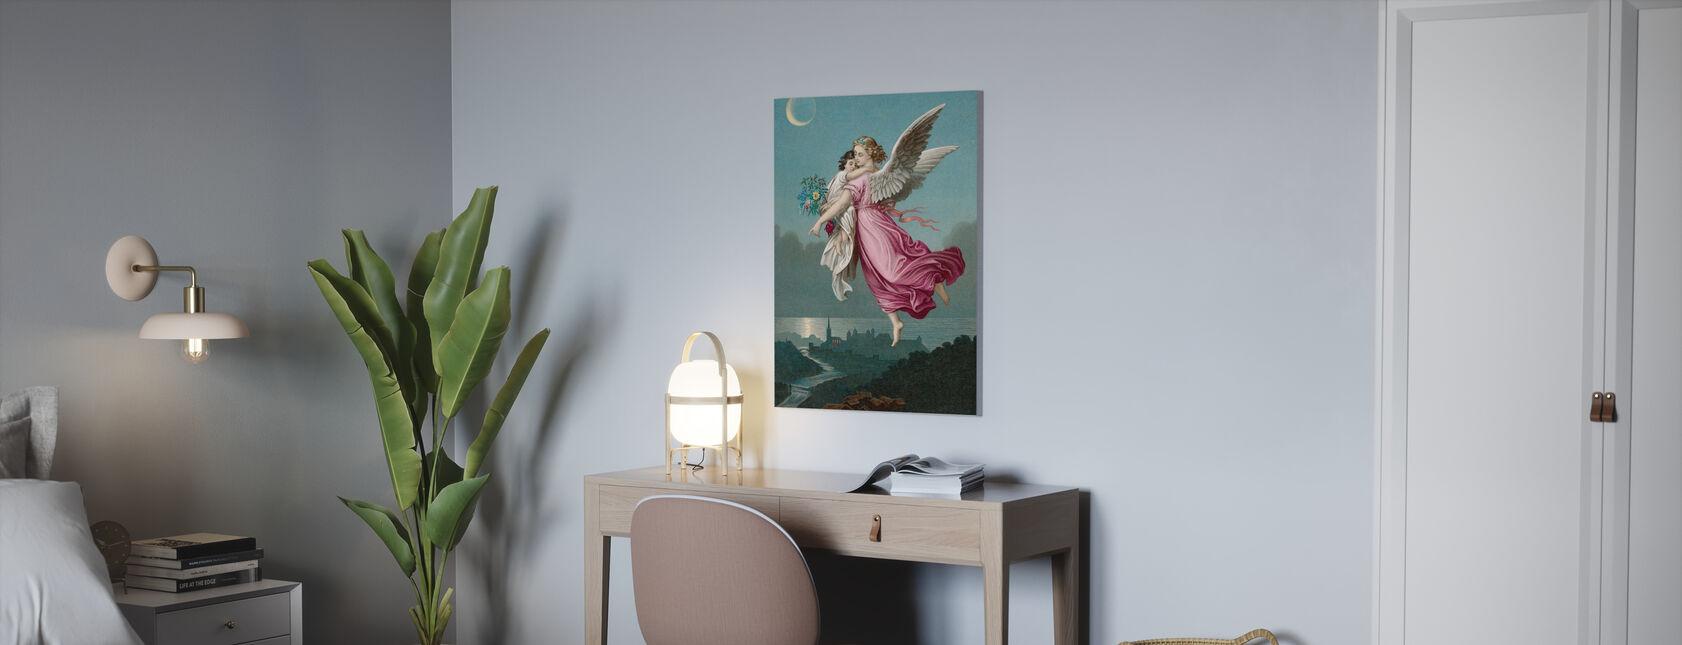 Draagt - Canvas print - Kantoor